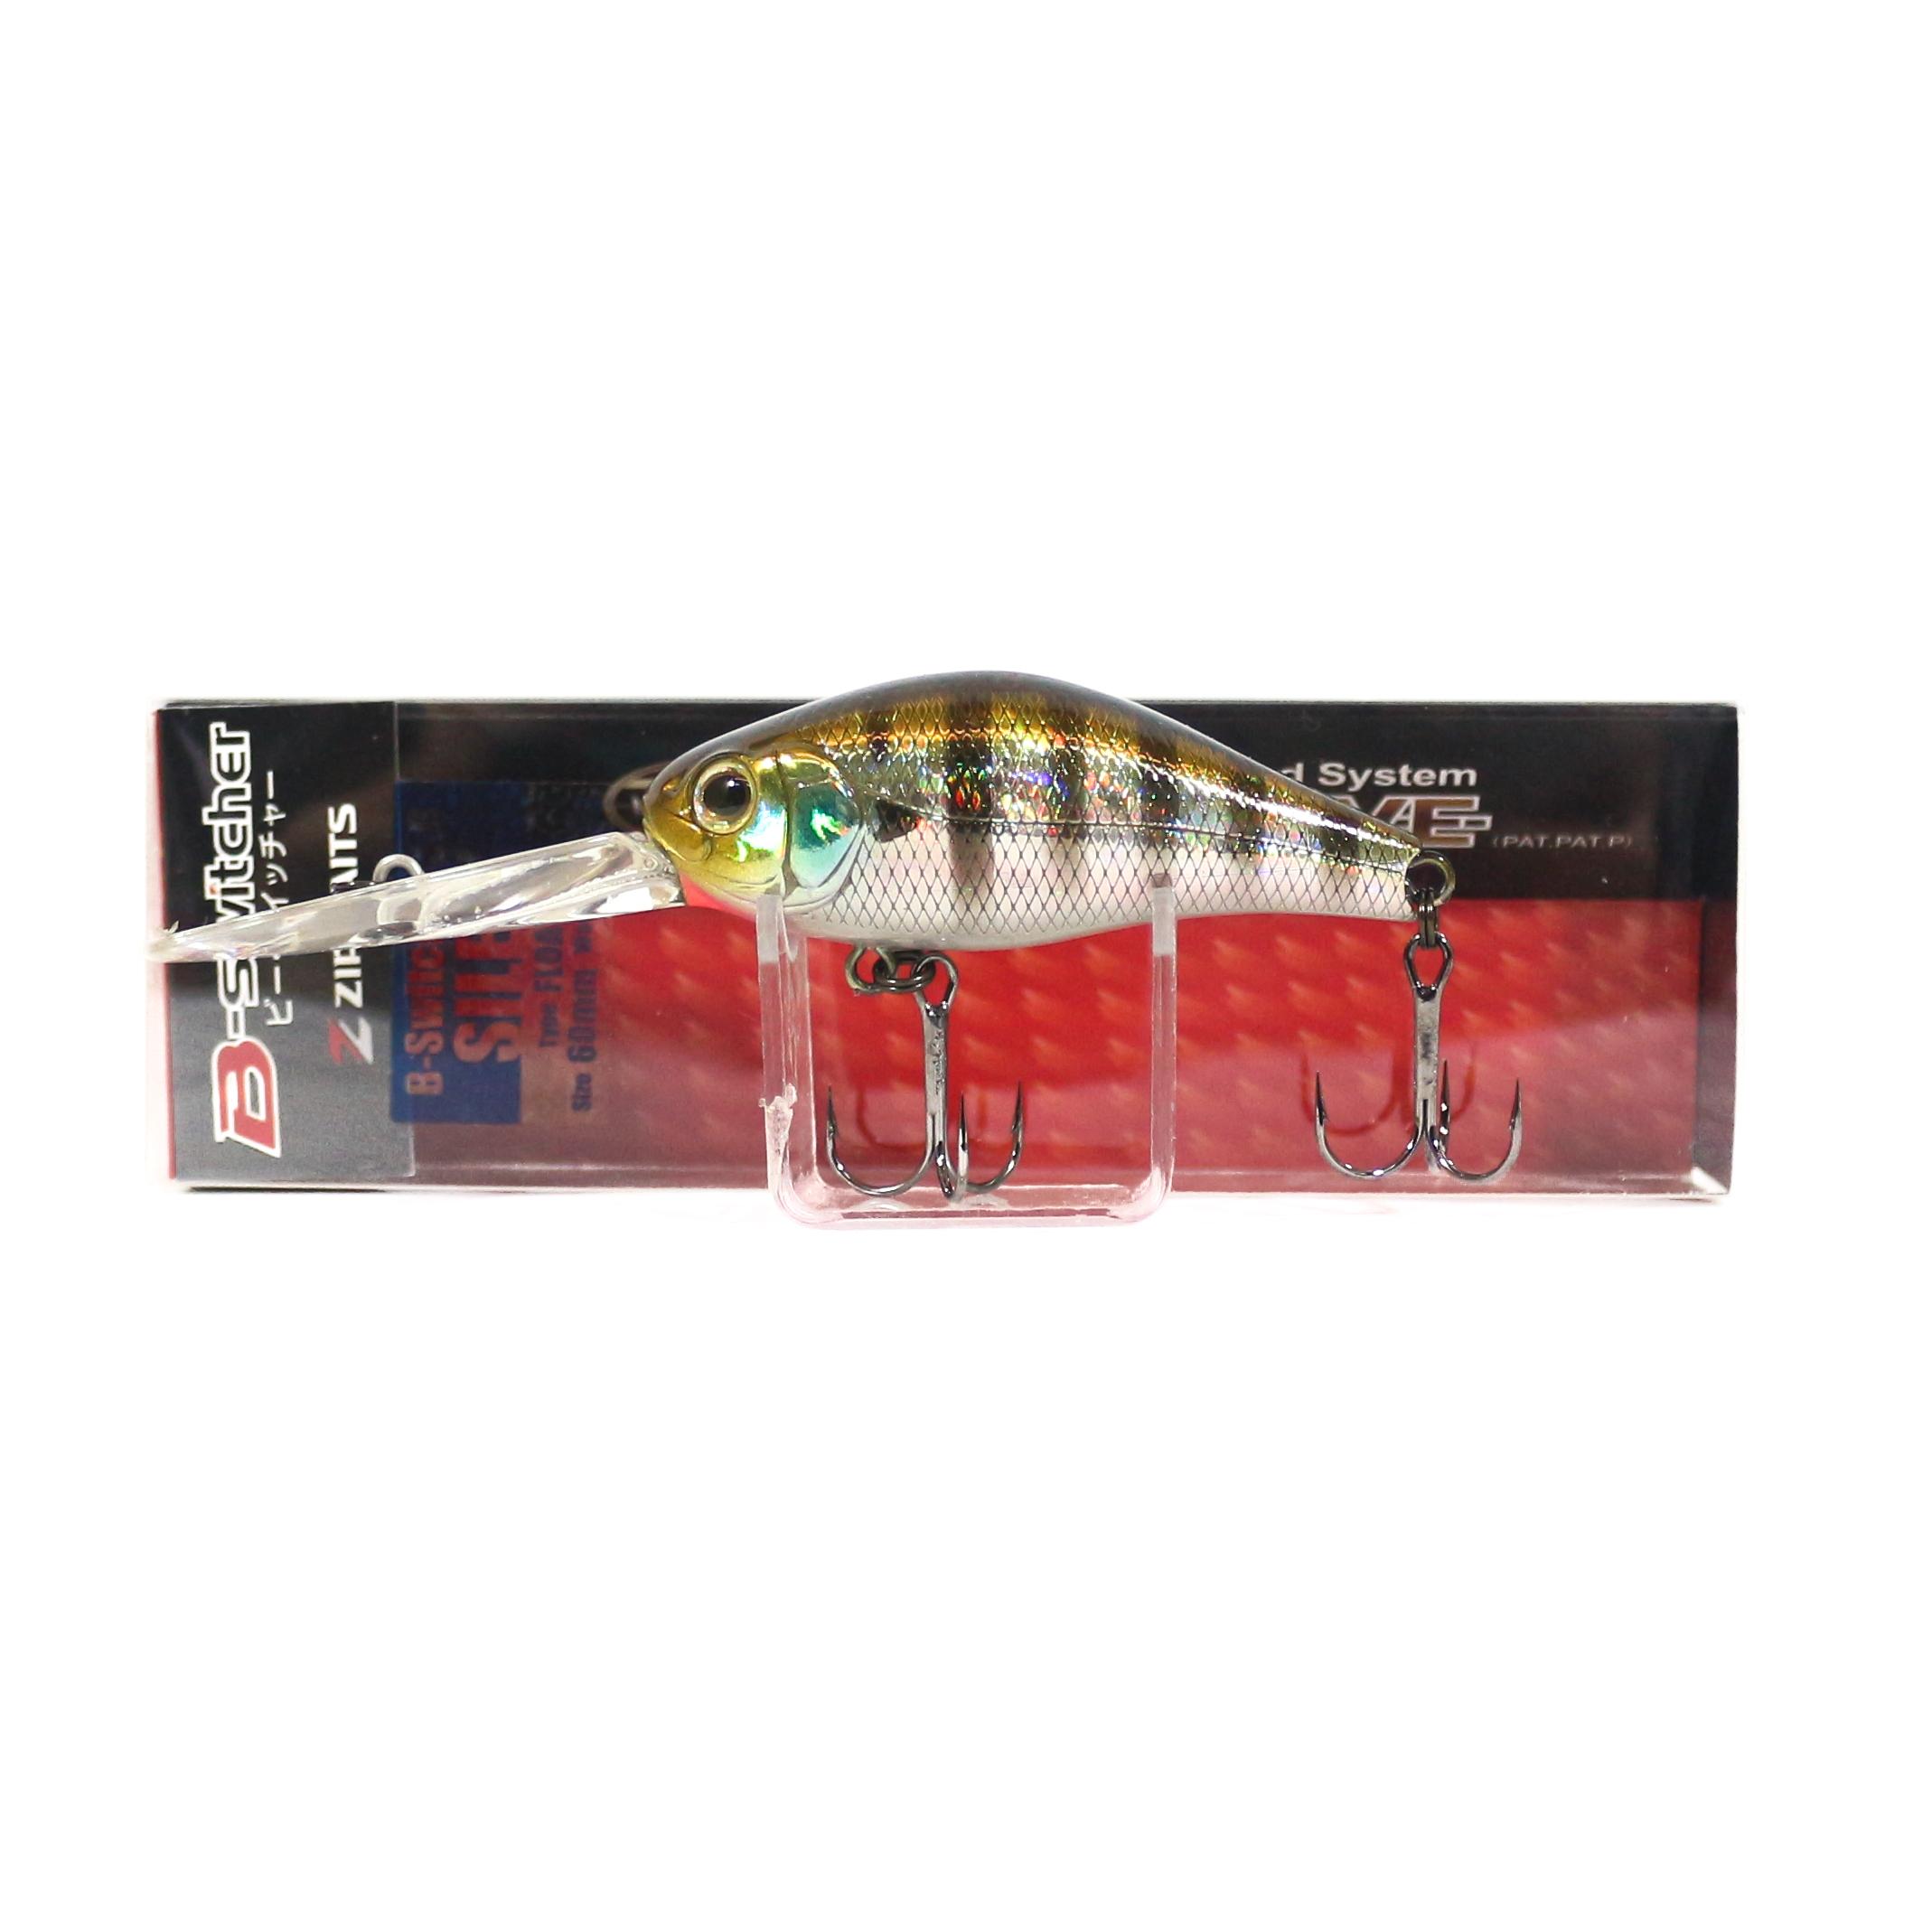 Zipbaits B Switcher 3.0 65mm Floating Lure 509 (7214)